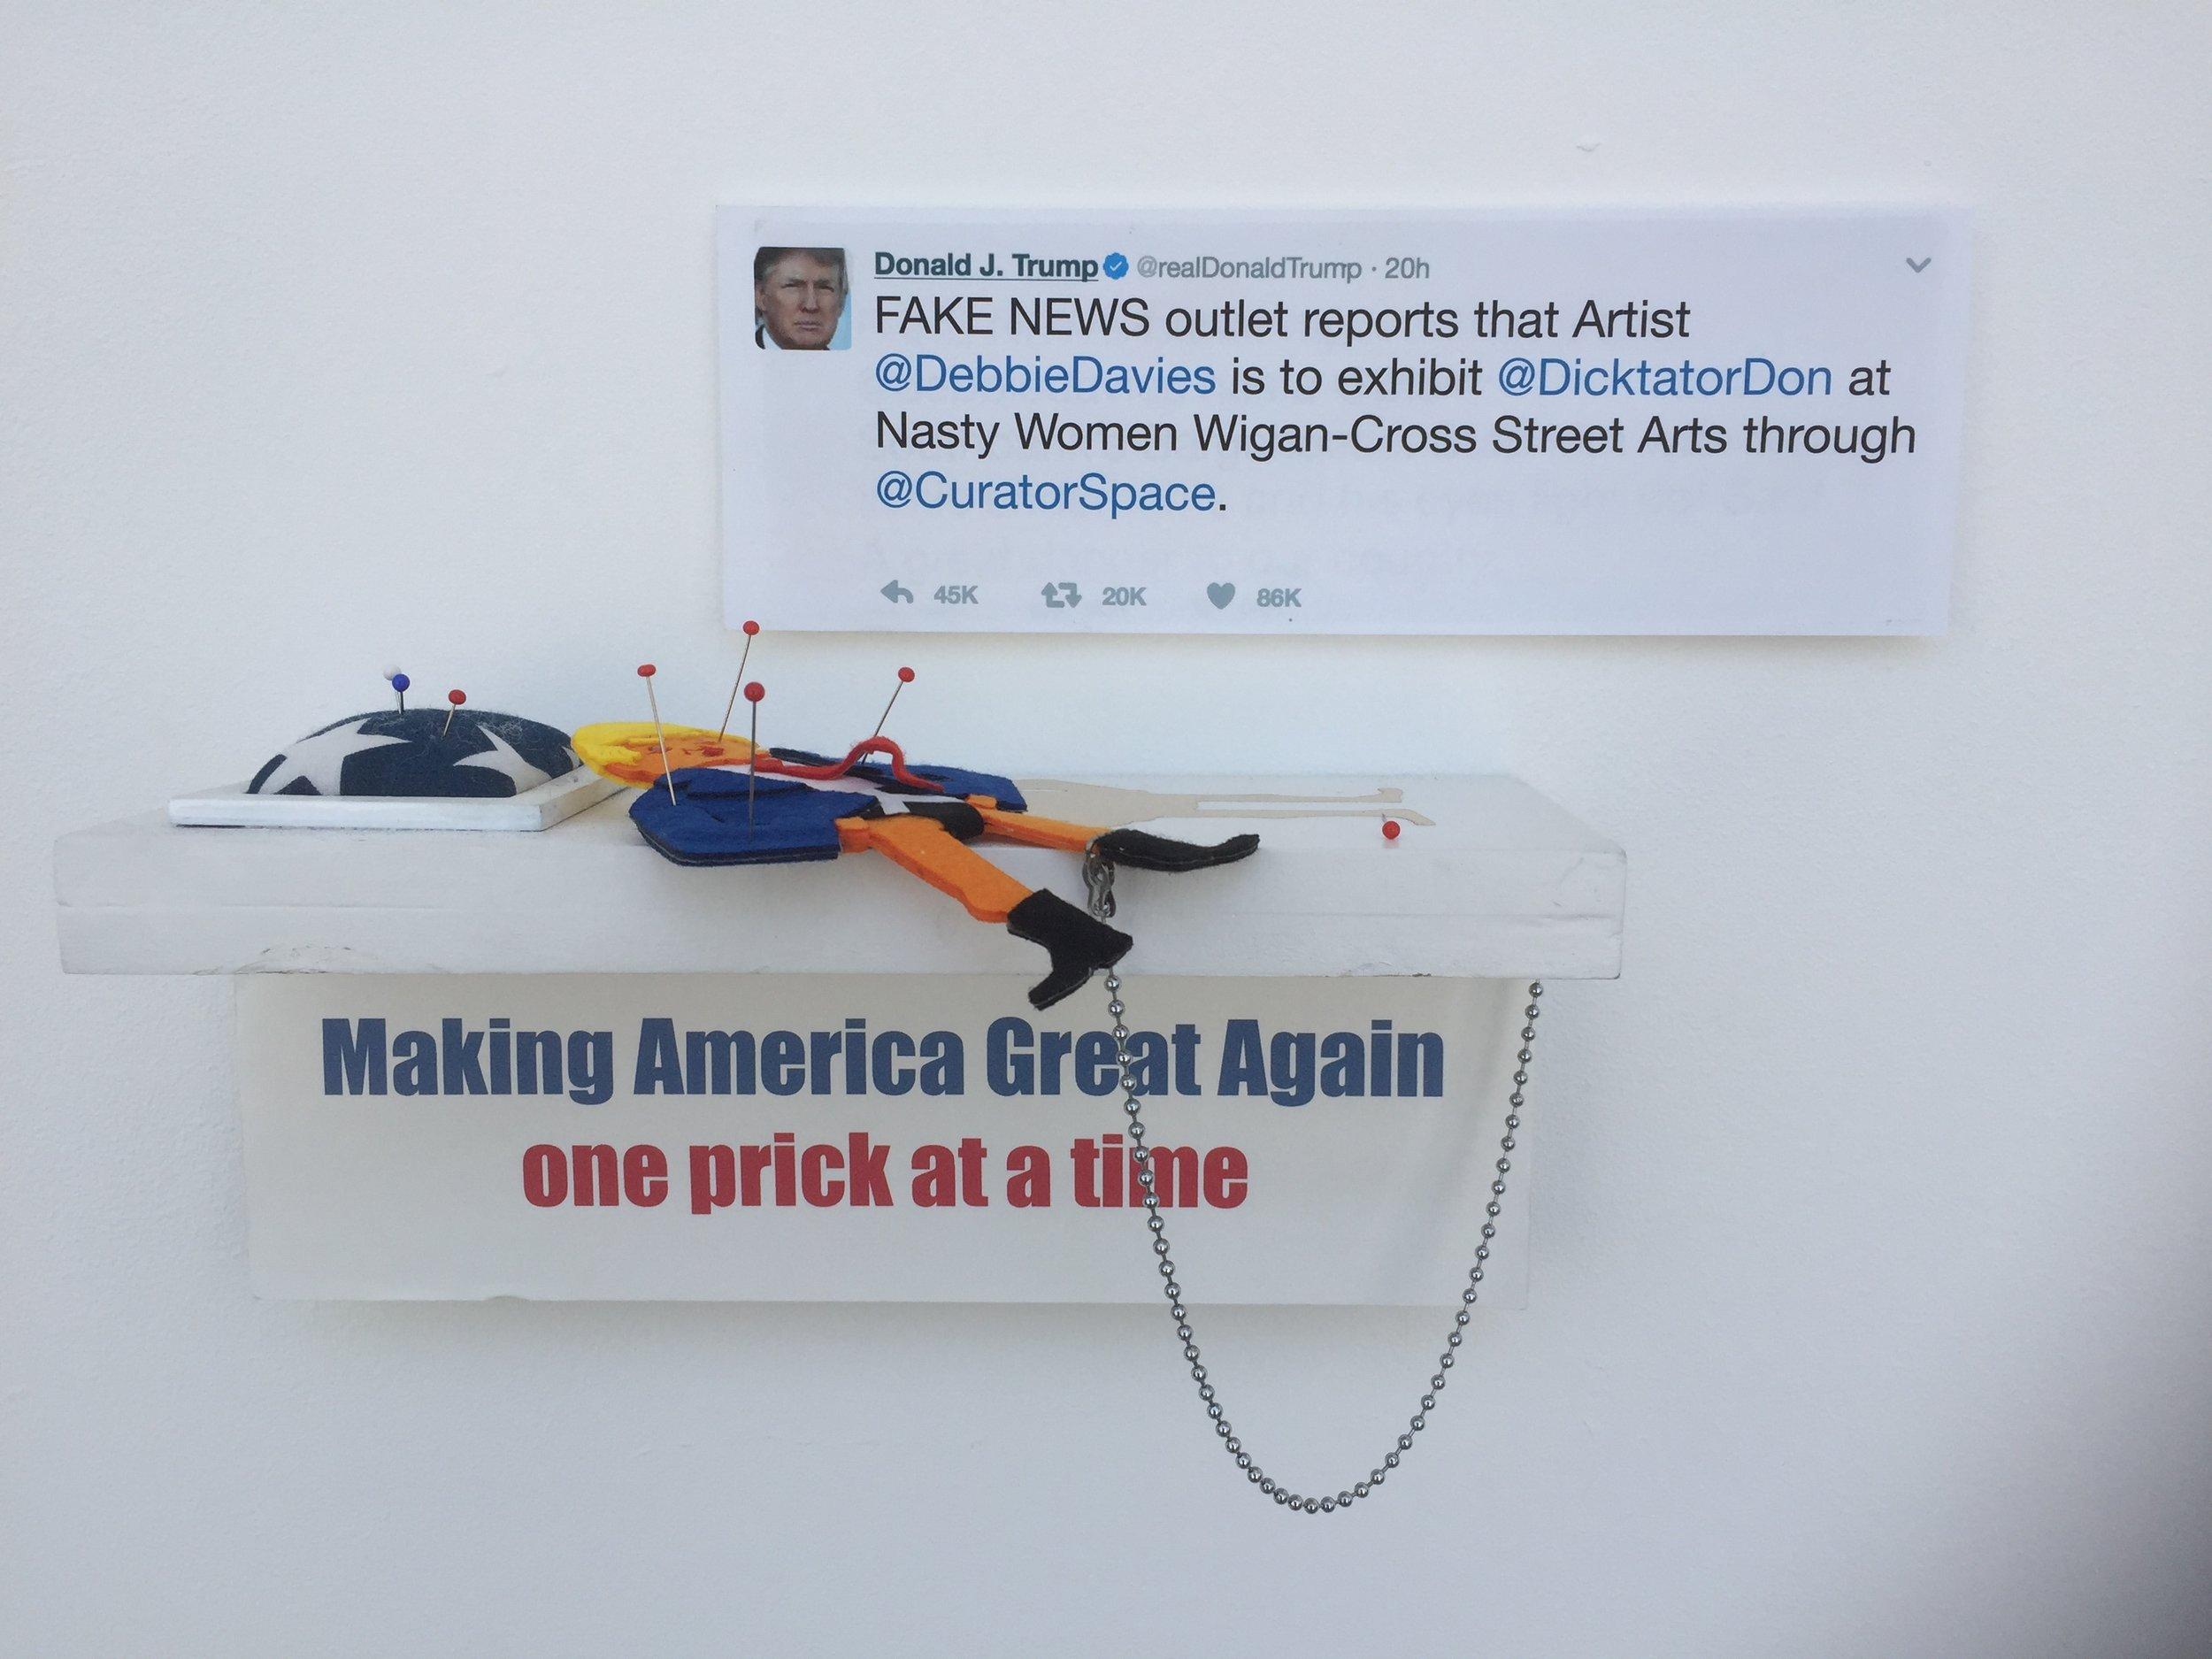 #DicktatorDon entered into Nasty Women Artist Call-Out